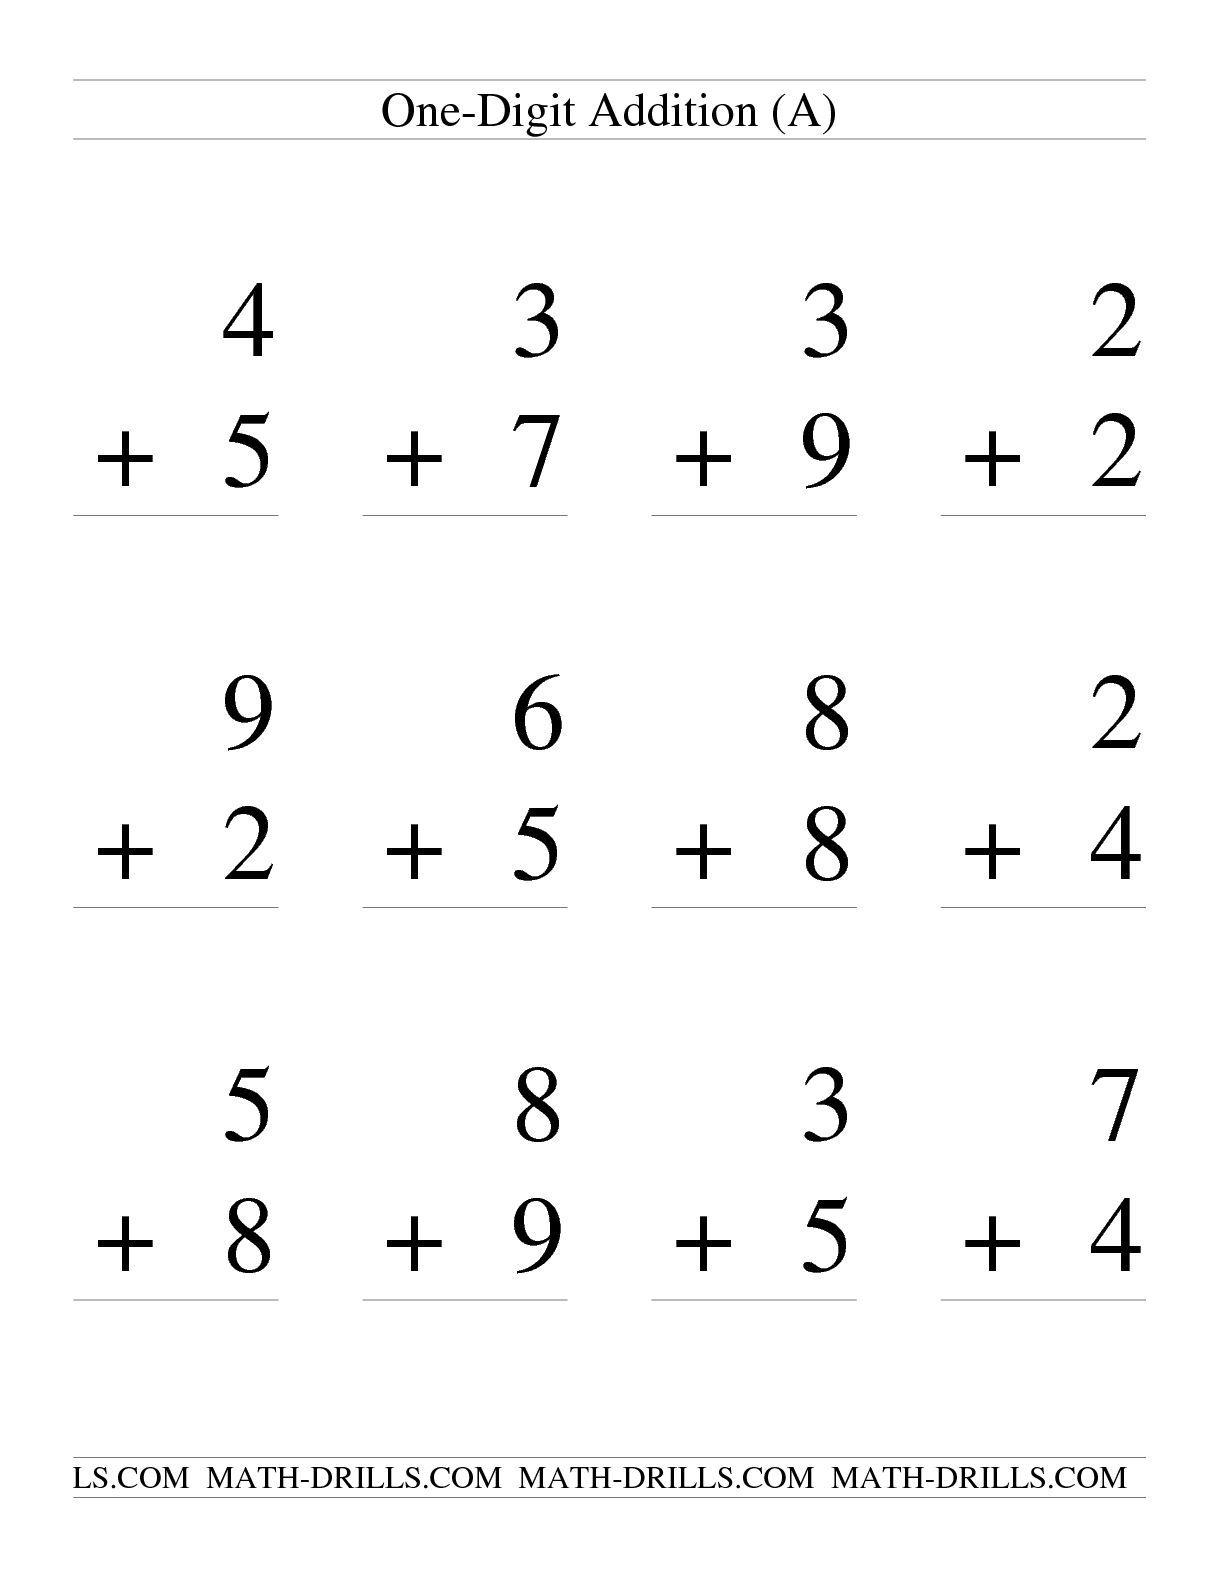 hight resolution of https://dubaikhalifas.com/single-digit-addition-worksheets-for-first-grade/